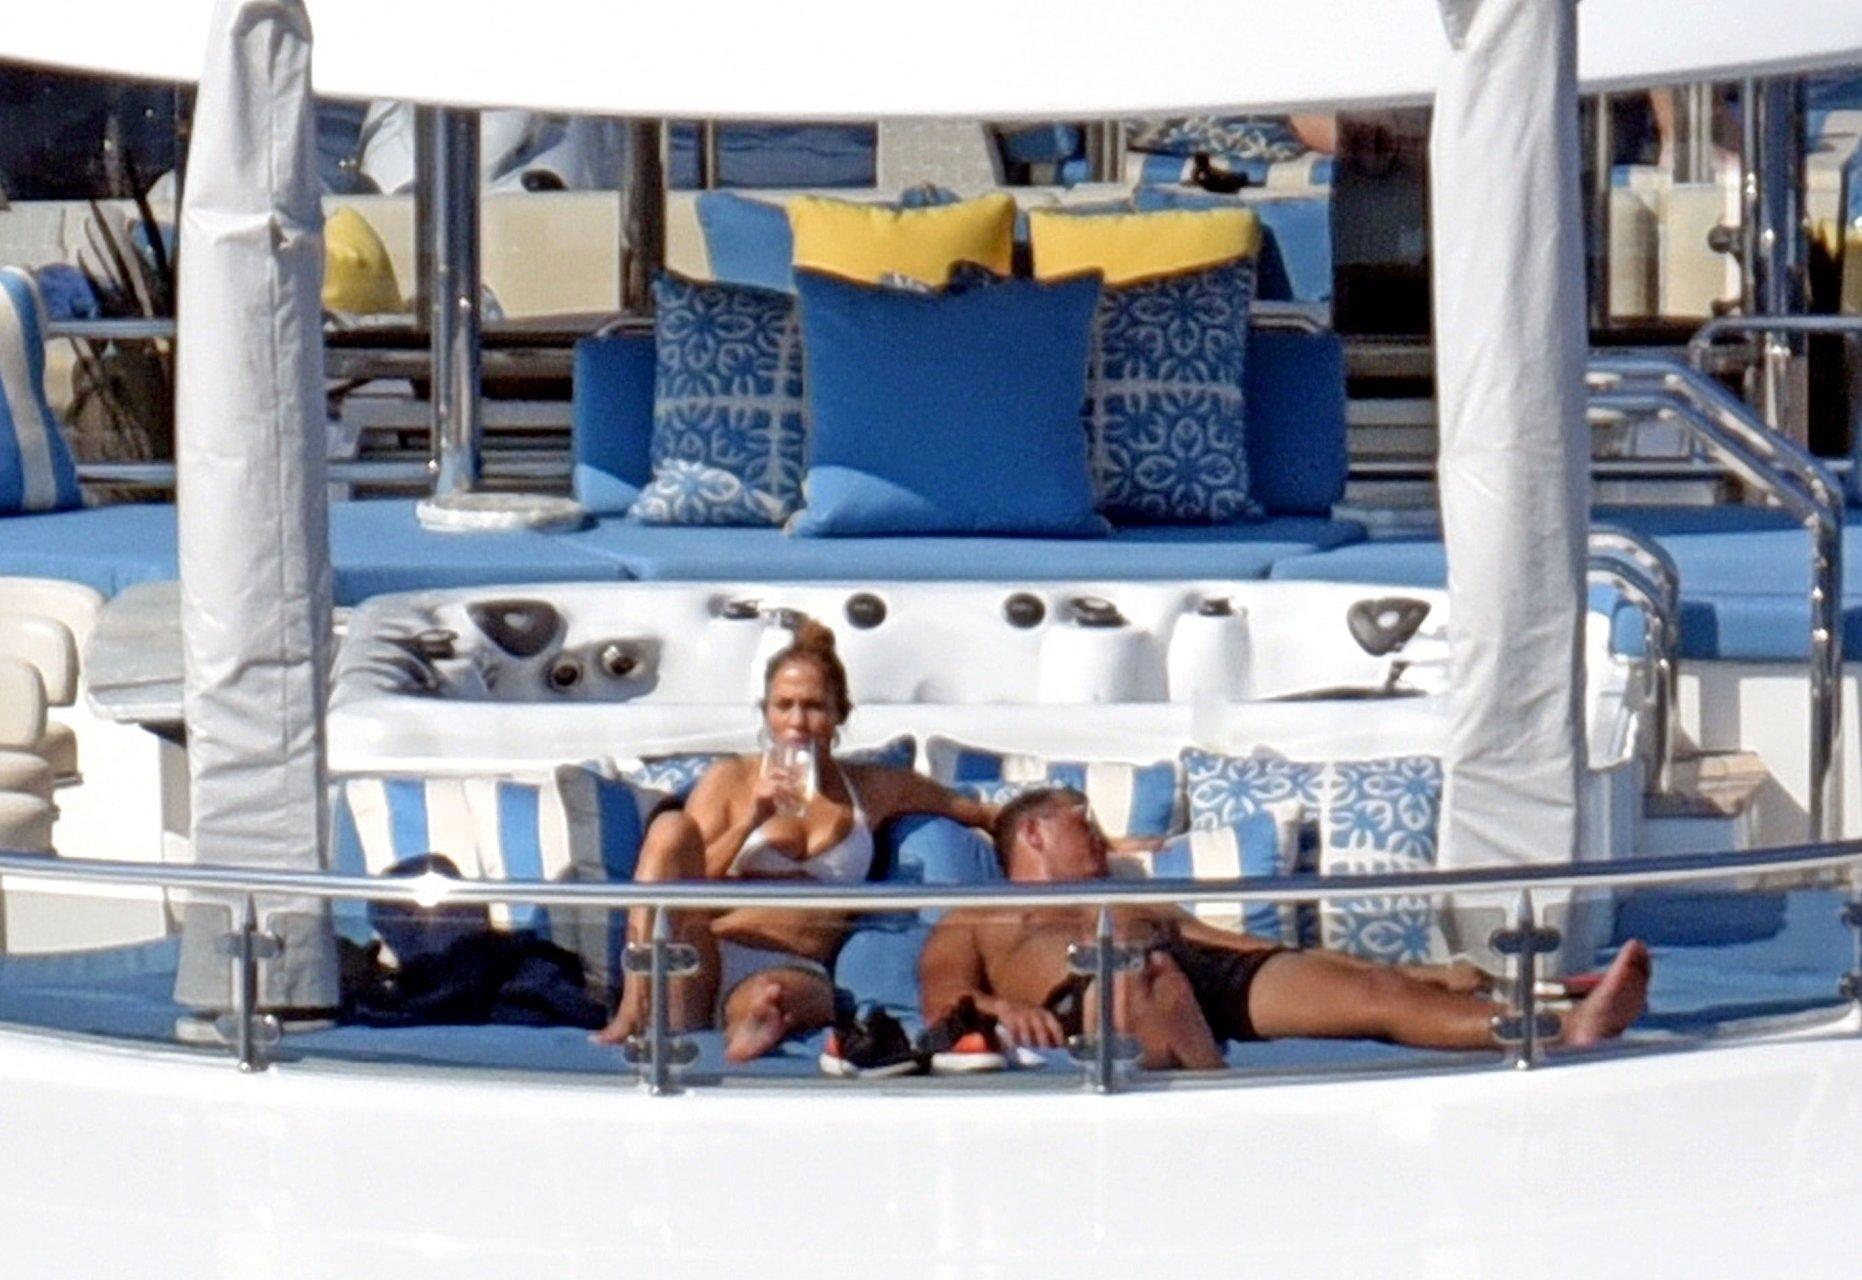 Jennifer-Lopez-Sexy-TheFappeningBlog.com-84.jpg